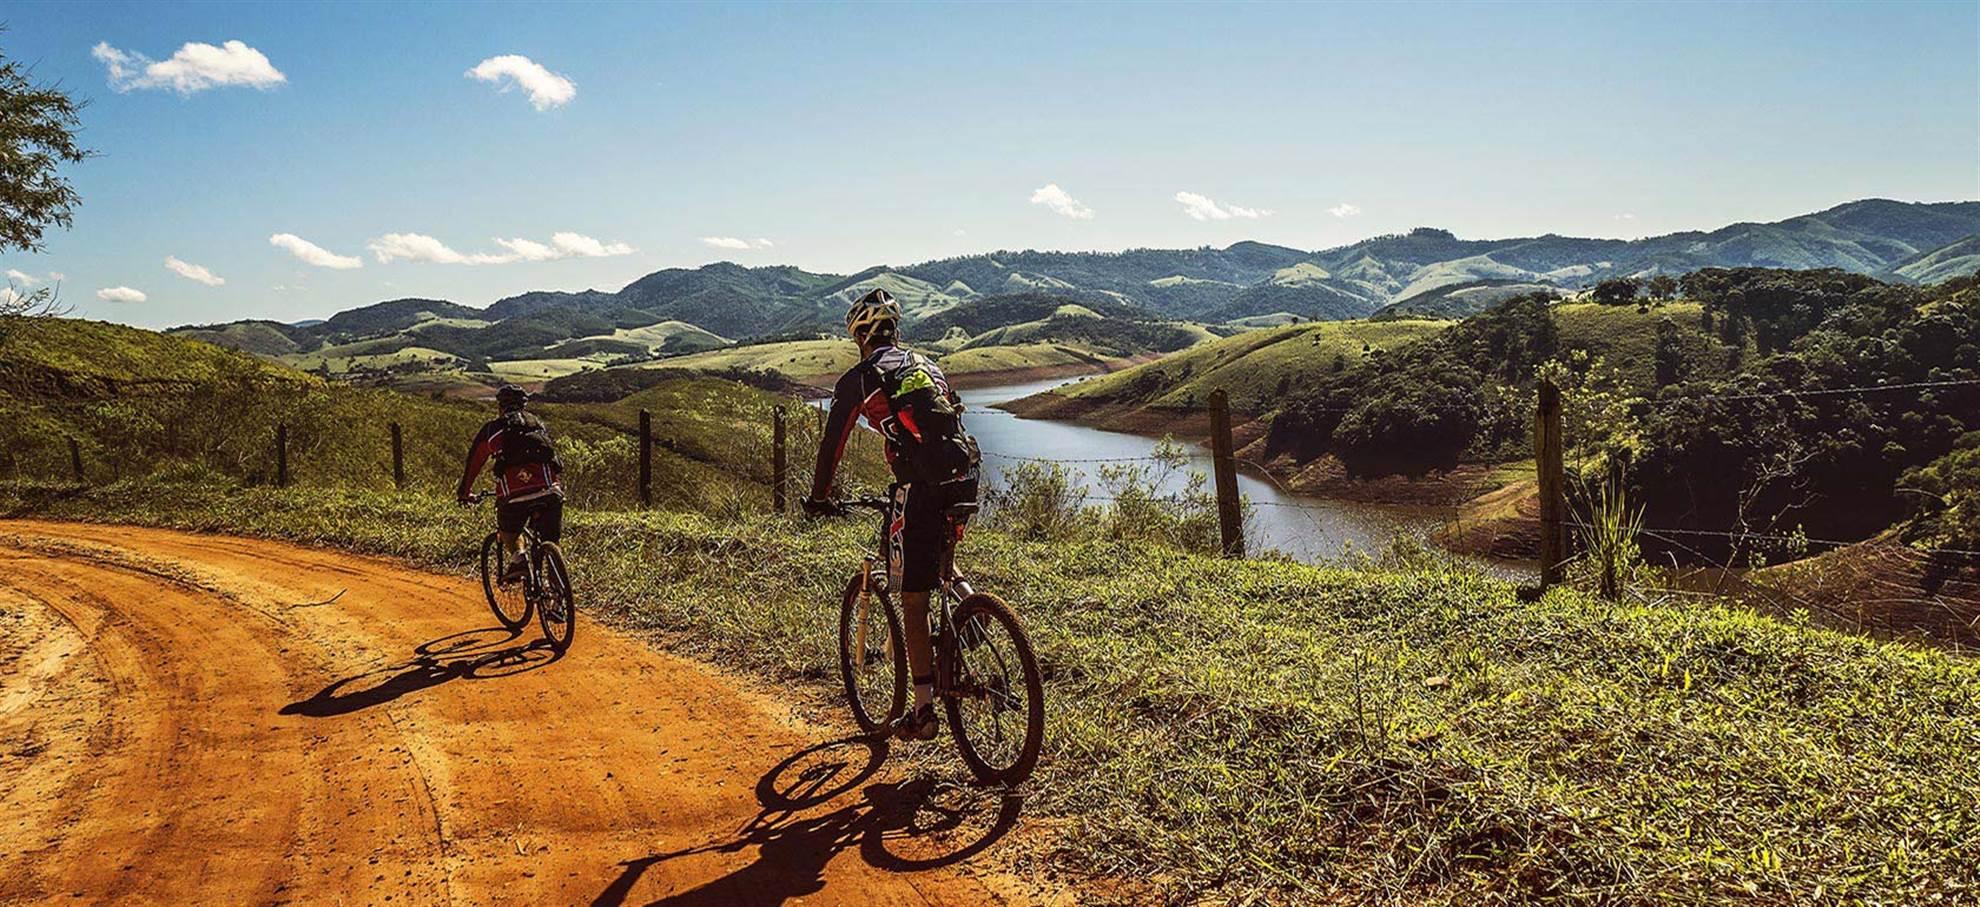 Mountainbiken MTB Tour Dehasa de Abajo